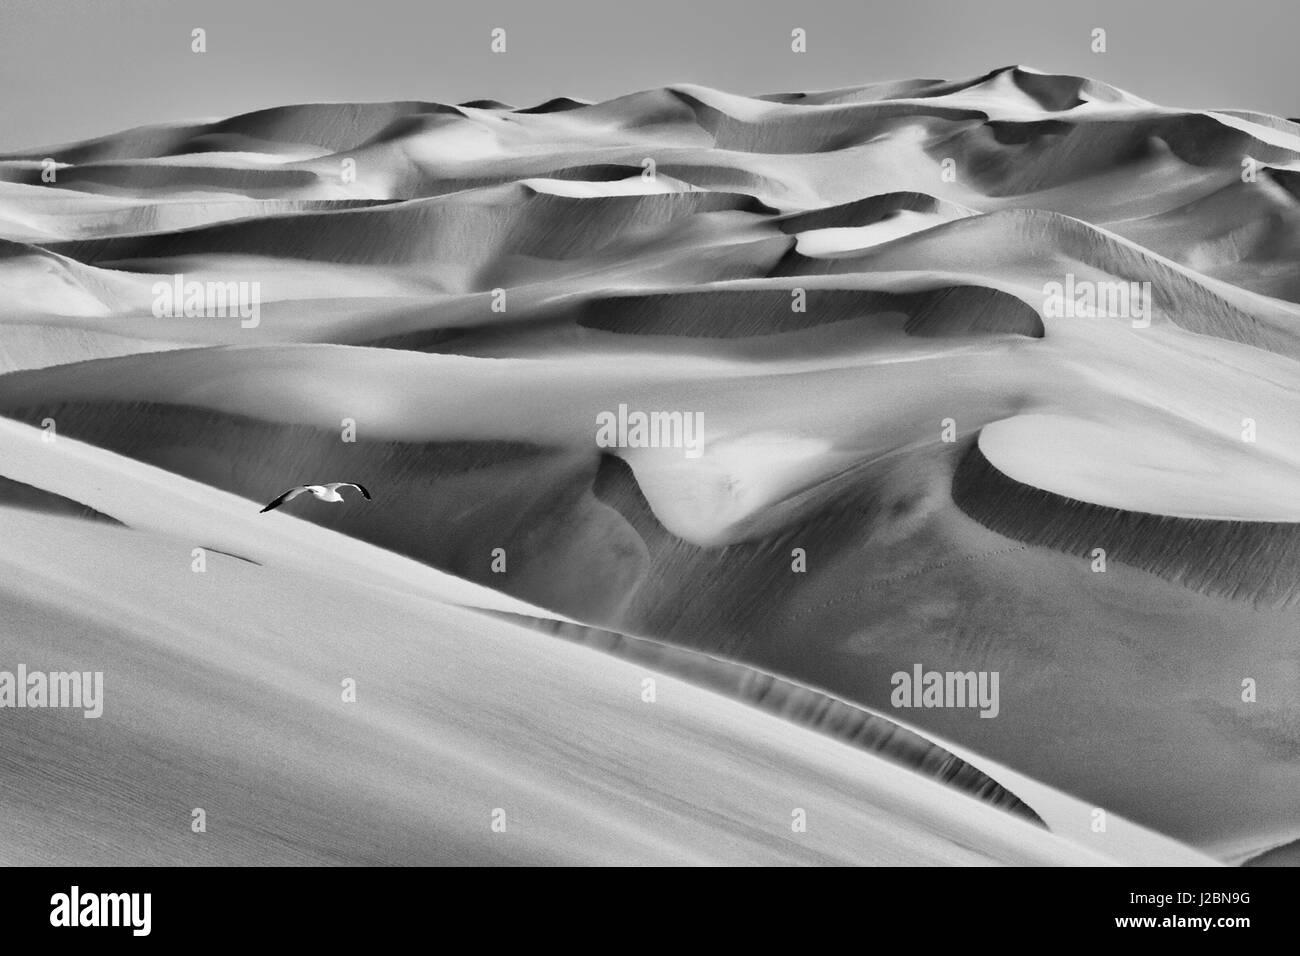 Sandwich Harbor, Namibia. Gull flies over immense sand dunes. - Stock Image